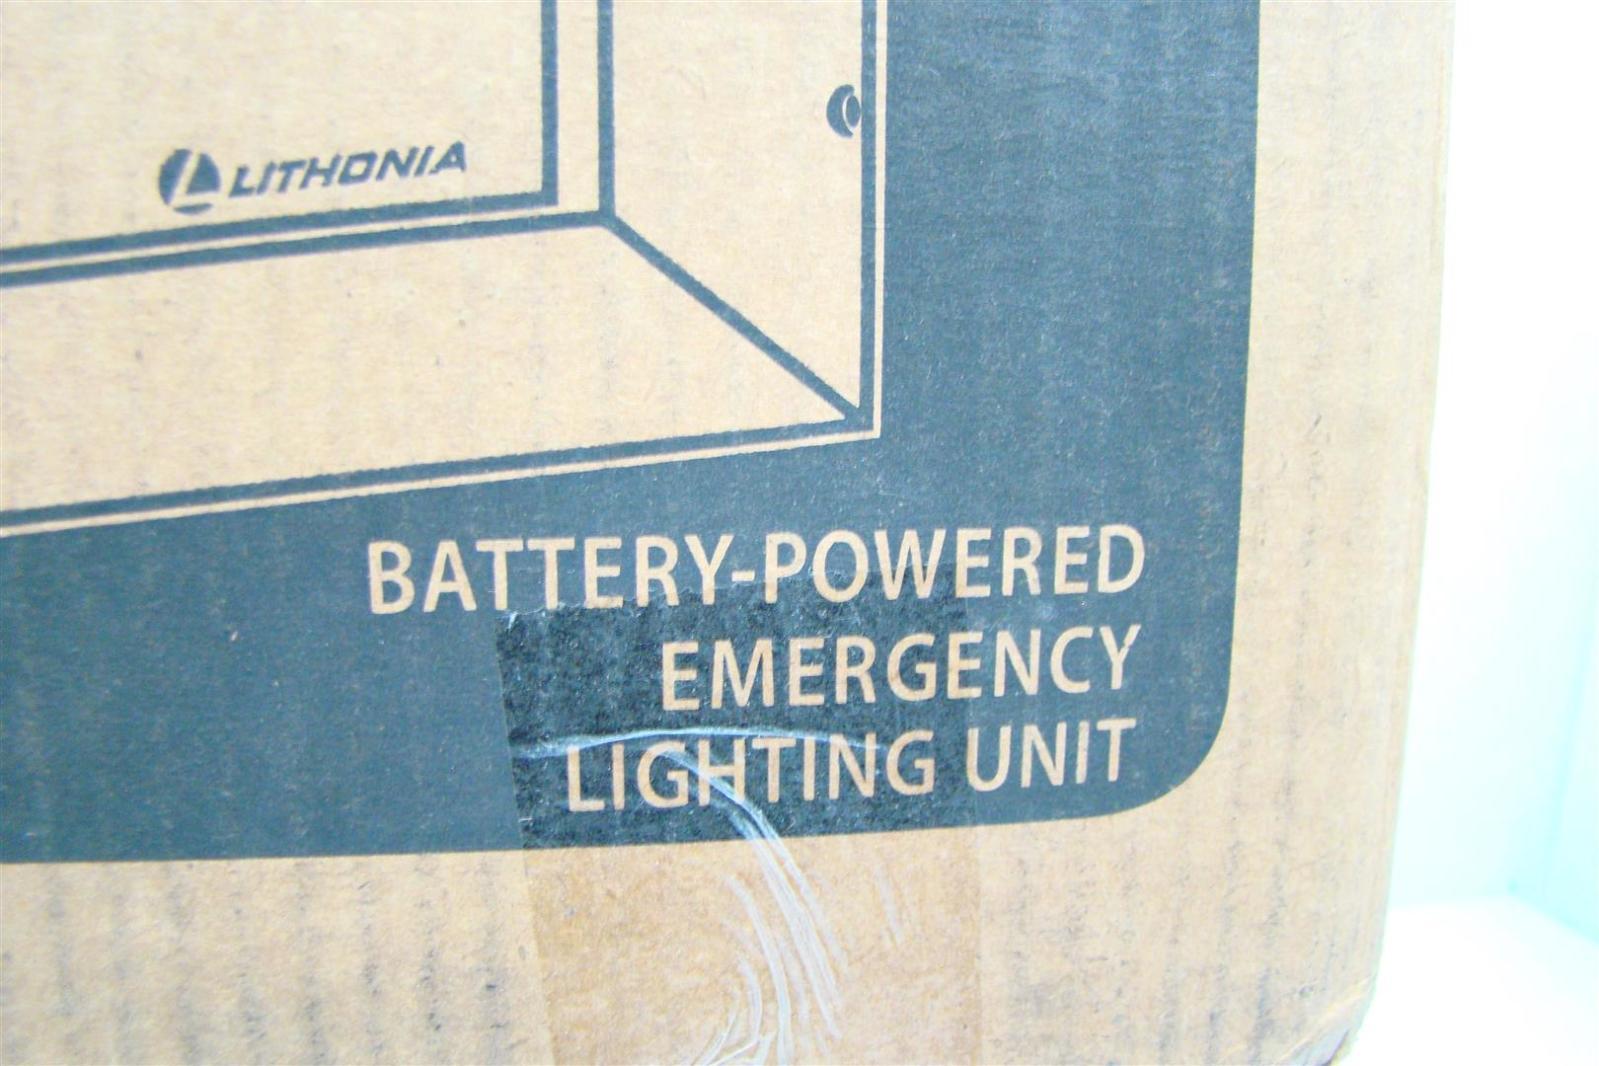 Lithonia Elt 125 Wiring Diagram Detailed Diagrams Titan Battery Powered Emergency Light 125w 12v Elt125lb Ebay Memphis